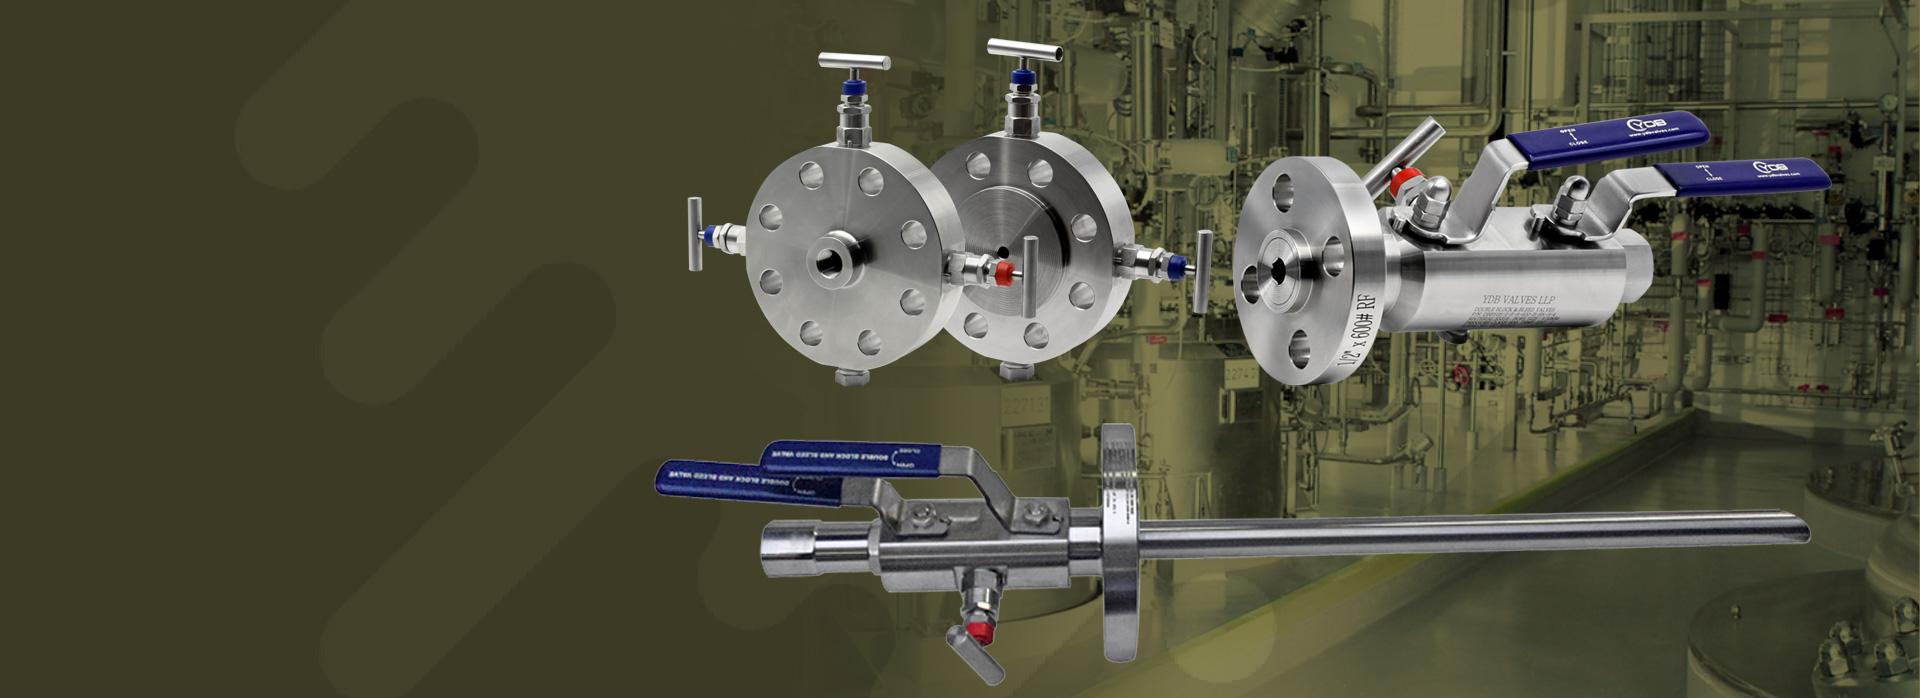 YDB LLP valves products: Double Block & Bleed ( DBB) Valves & Monoflange Valves